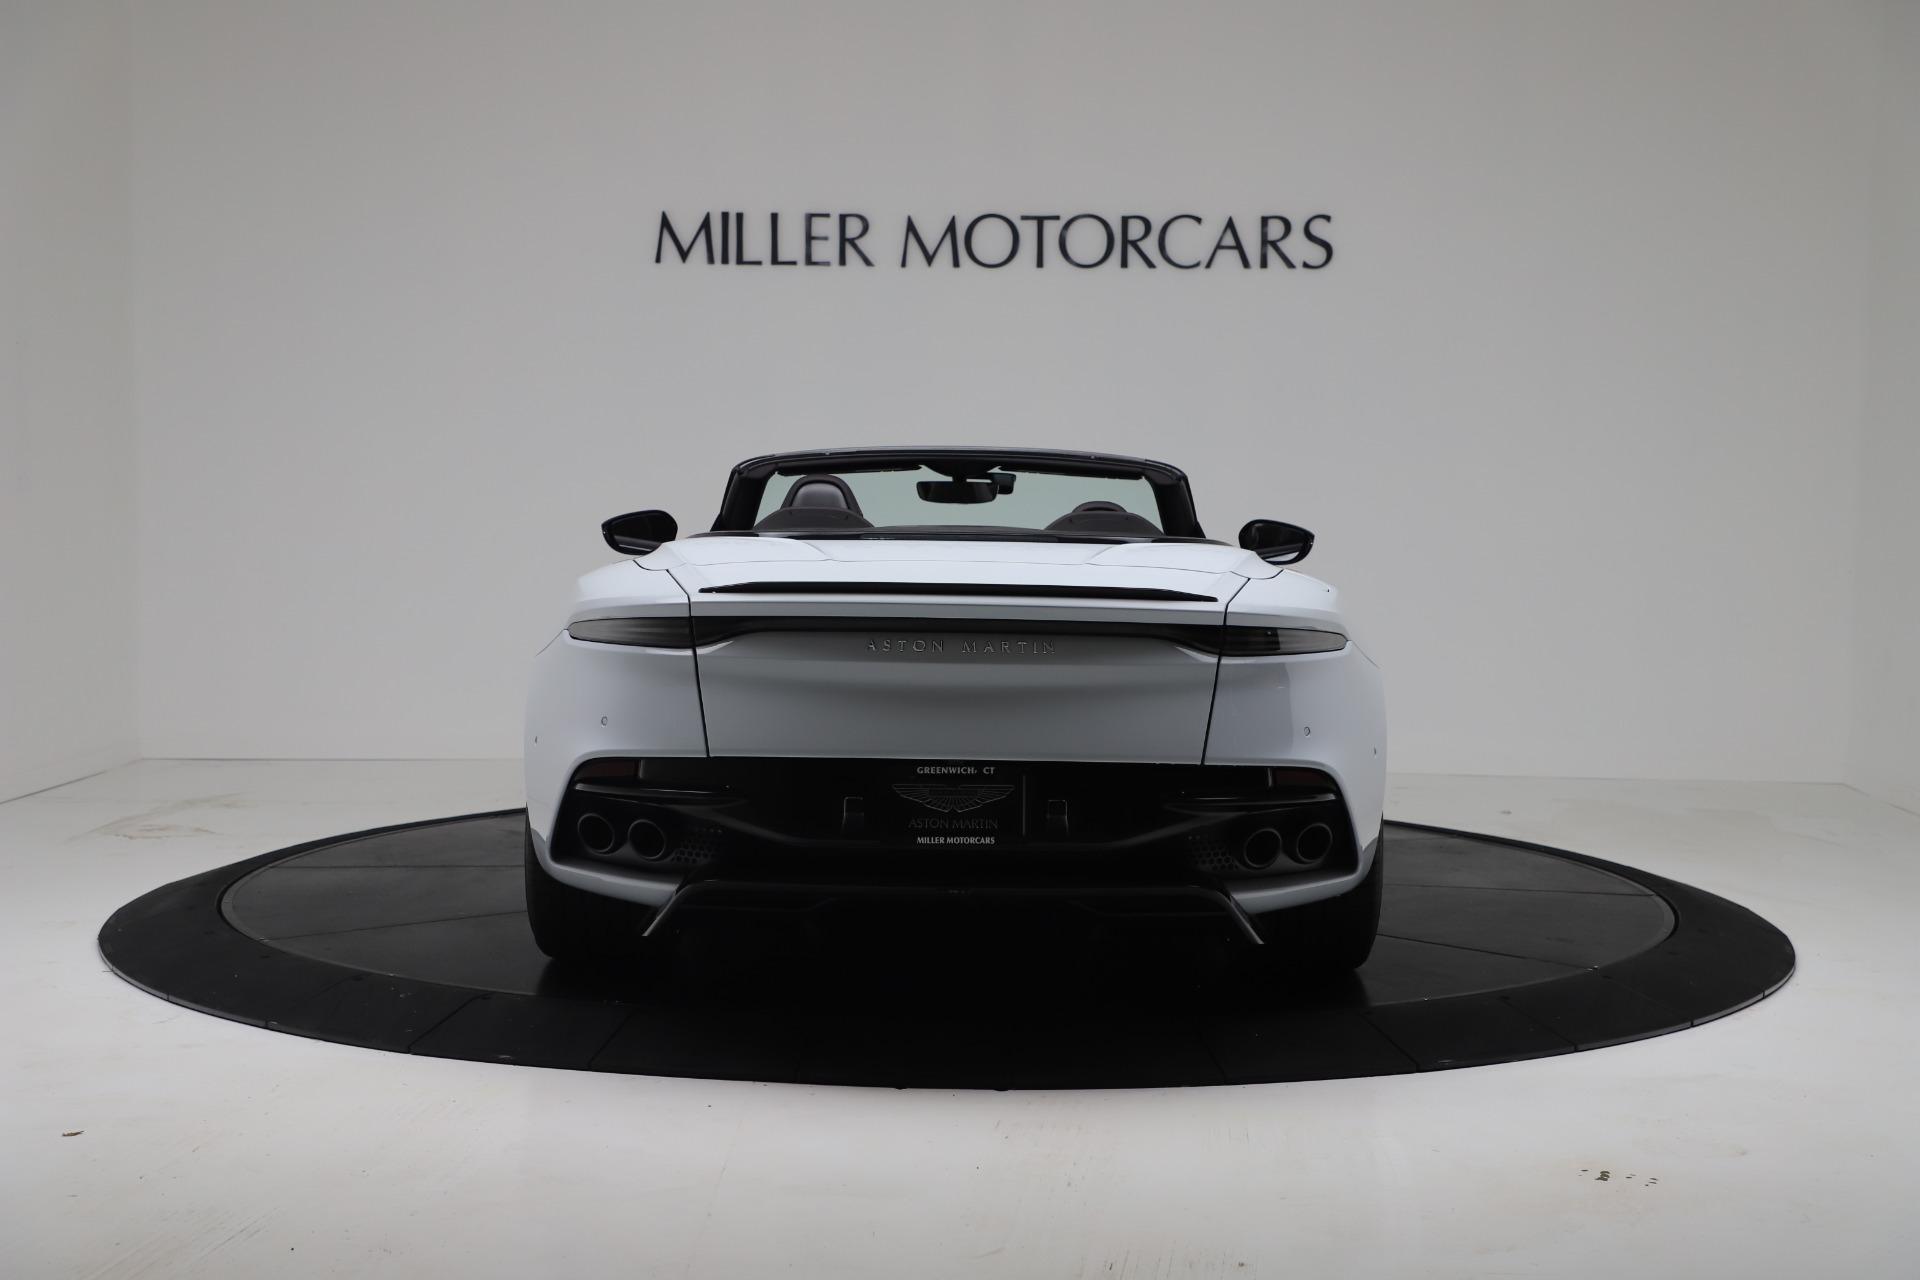 New 2020 Aston Martin DBS Superleggera Volante Convertible For Sale In Westport, CT 3484_p5